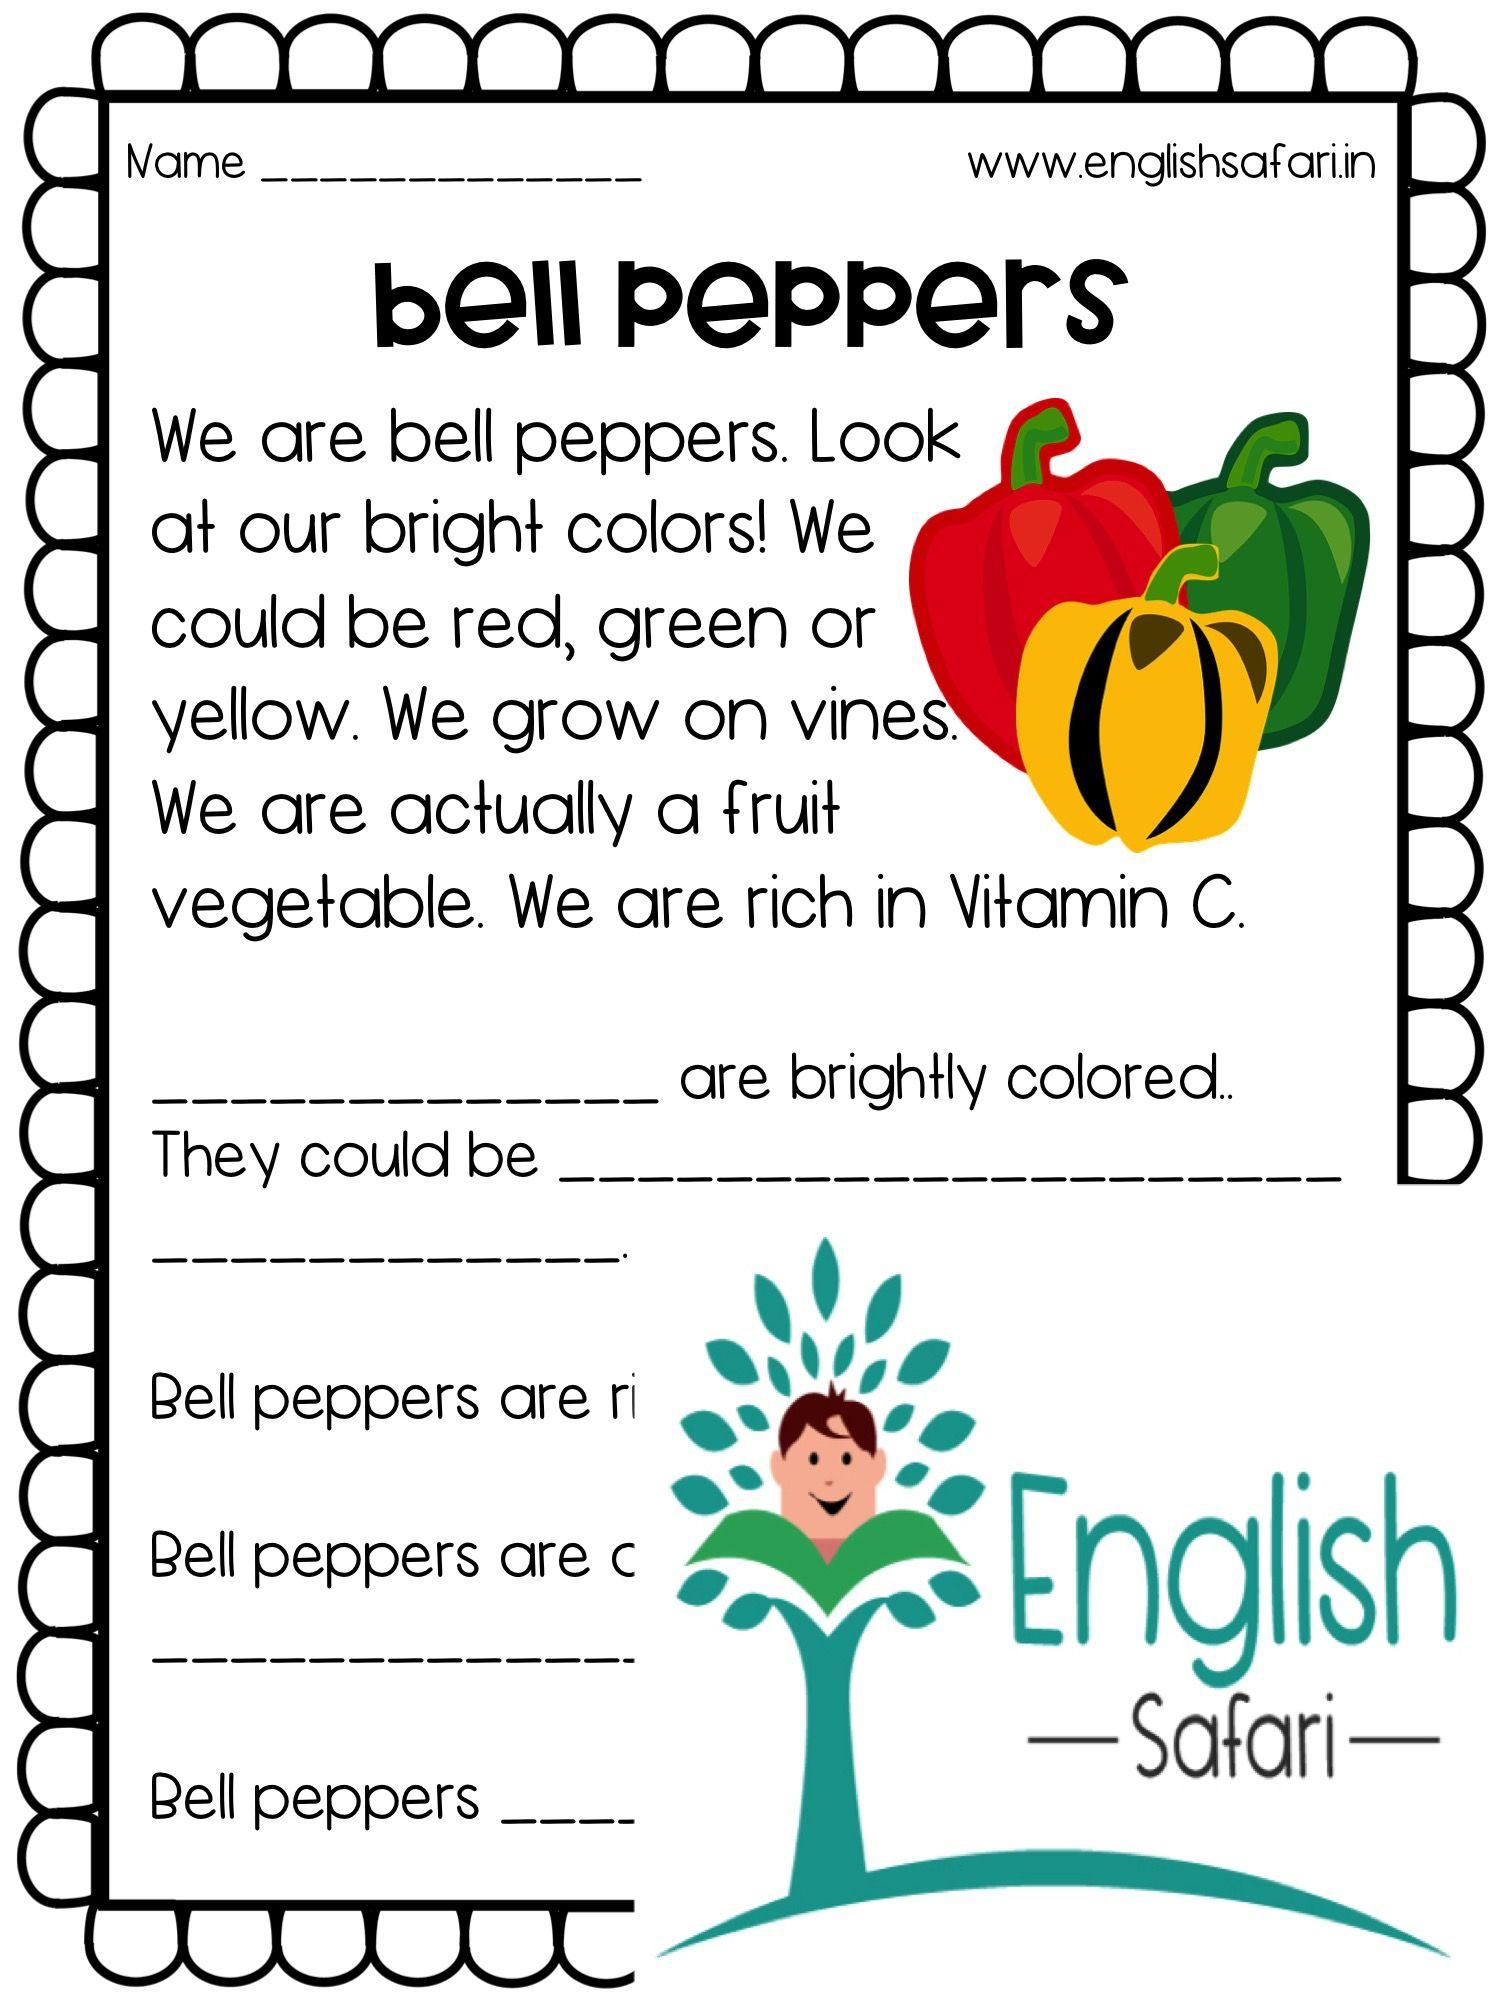 Reading Comprehension For Vegetables Reading Comprehension Practice Reading Comprehension For Kids Reading Comprehension [ 2000 x 1500 Pixel ]